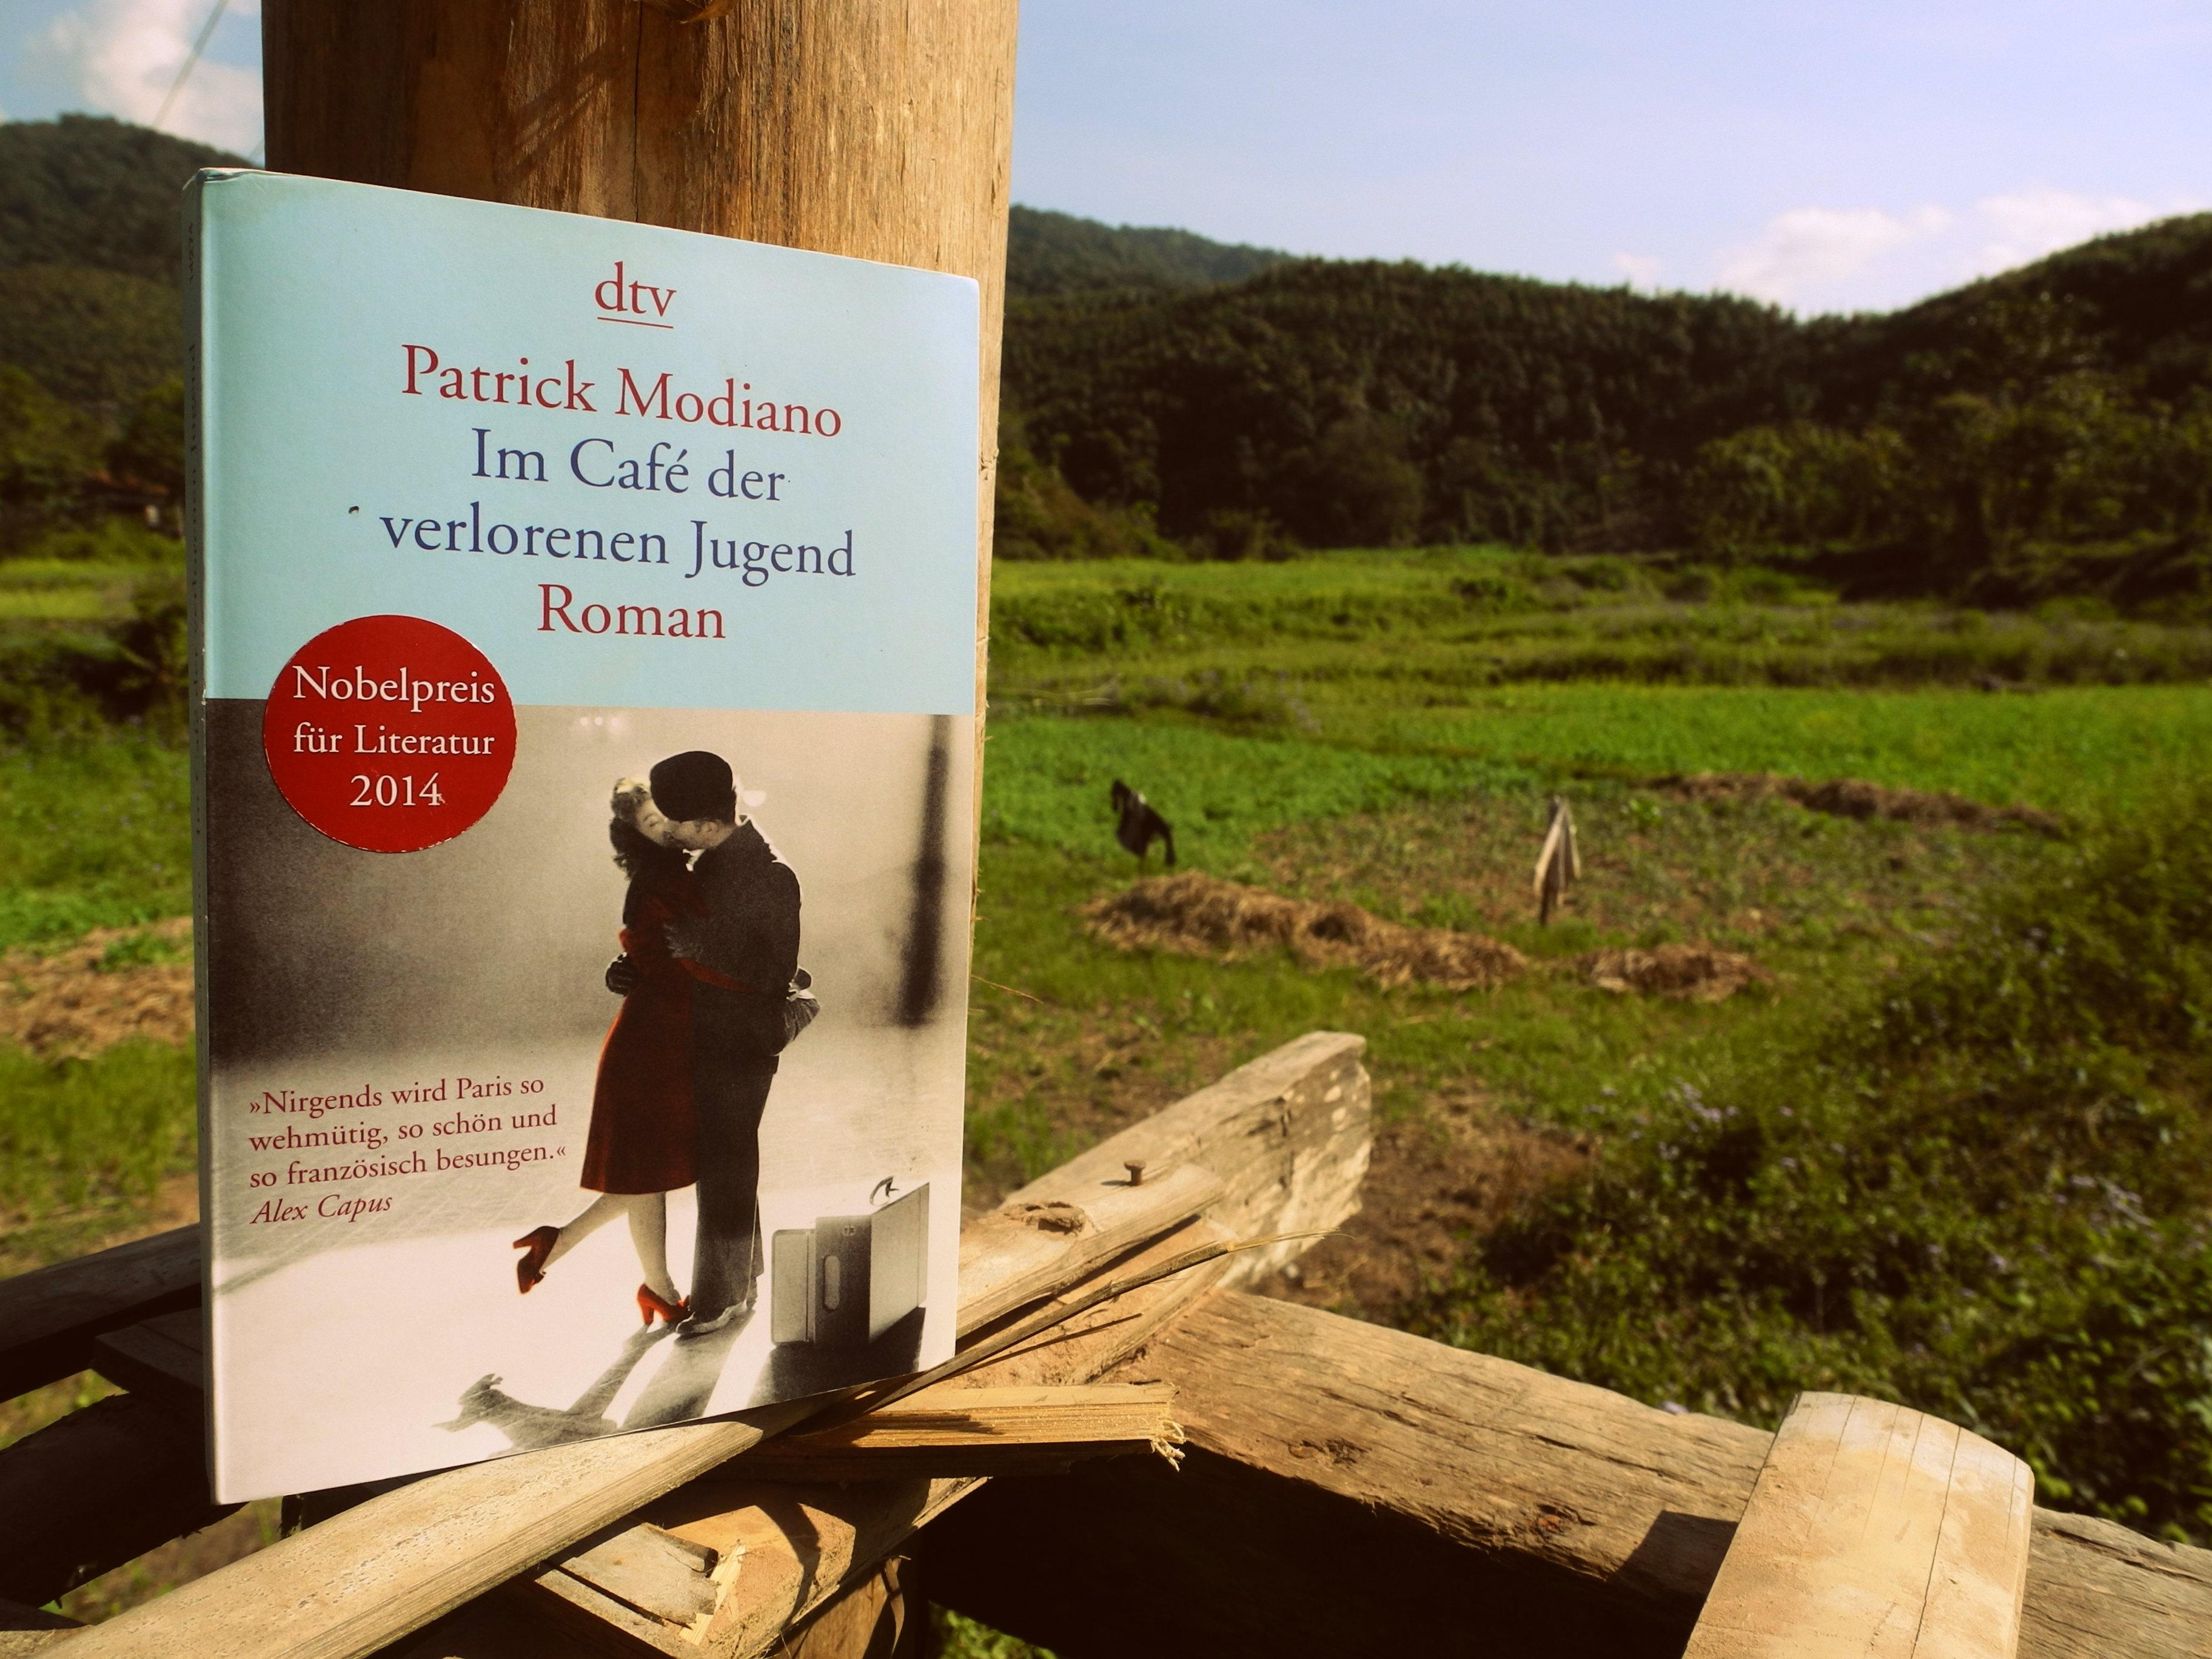 Patrick Modiano Im Café der verlorenen Jugend